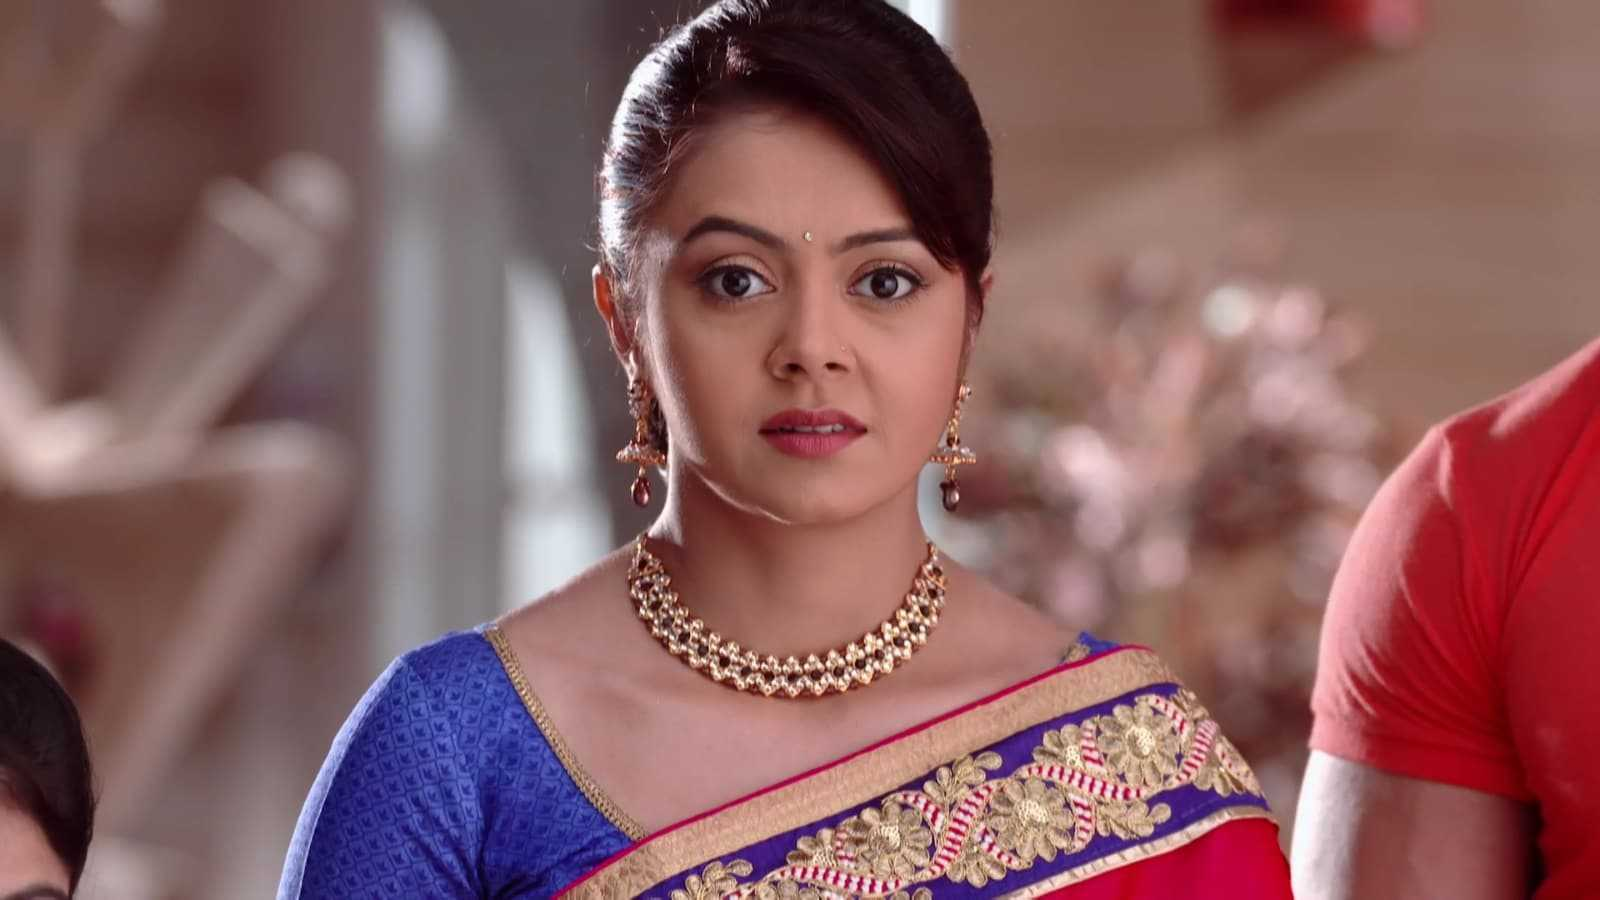 Saath Nibhana Saathiya 9th June 2016 Episode Written Updates